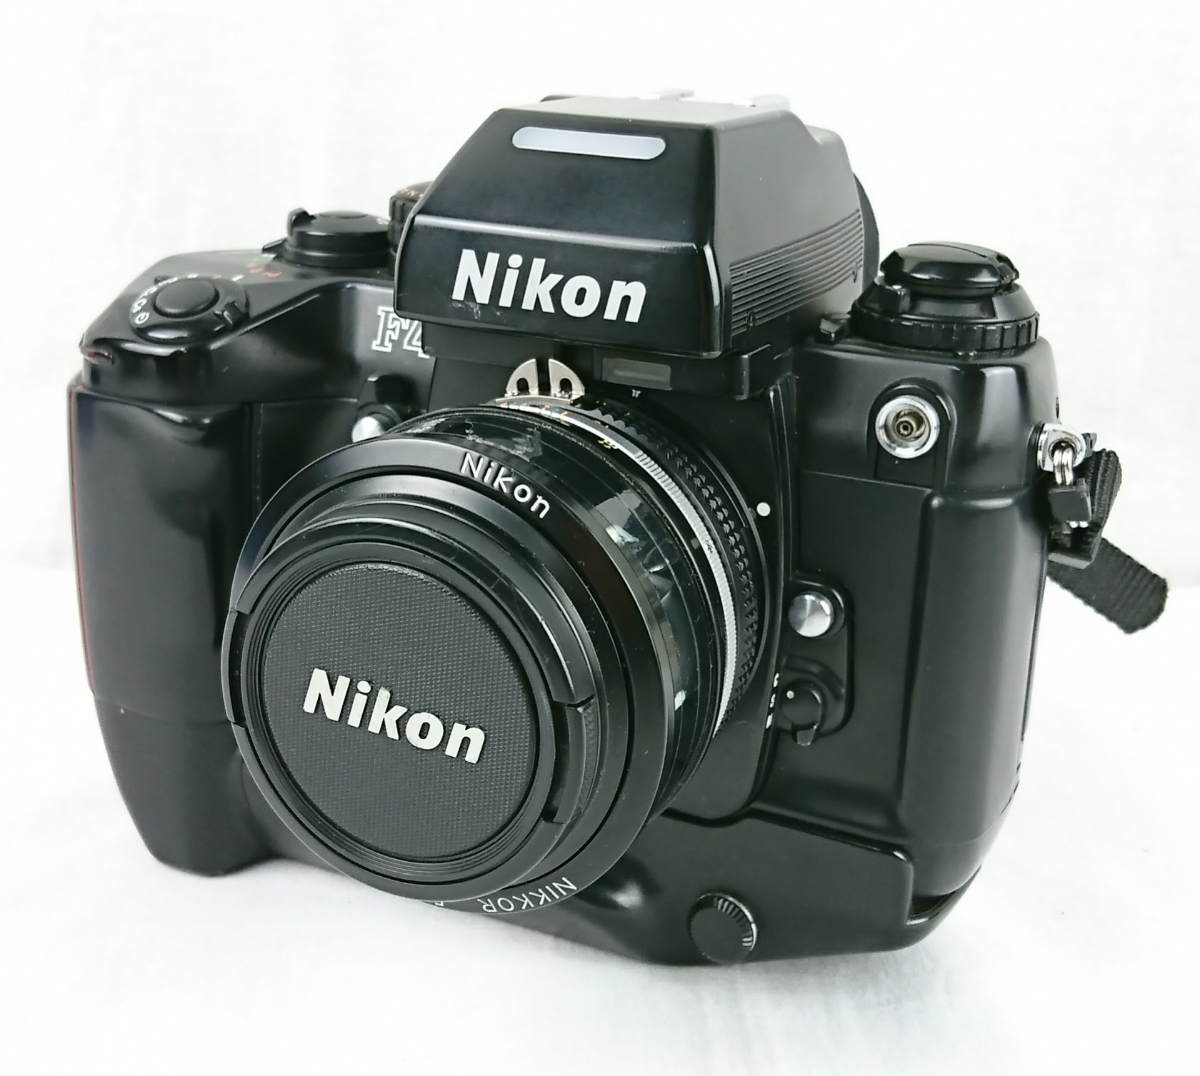 【GO-391】 Nikon ニコン カメラ F4 AF オートフォーカス レンズ NIKKOR 50mm 1:1.2 MB-21 一眼レフ ジウジアーロデザインカメラ